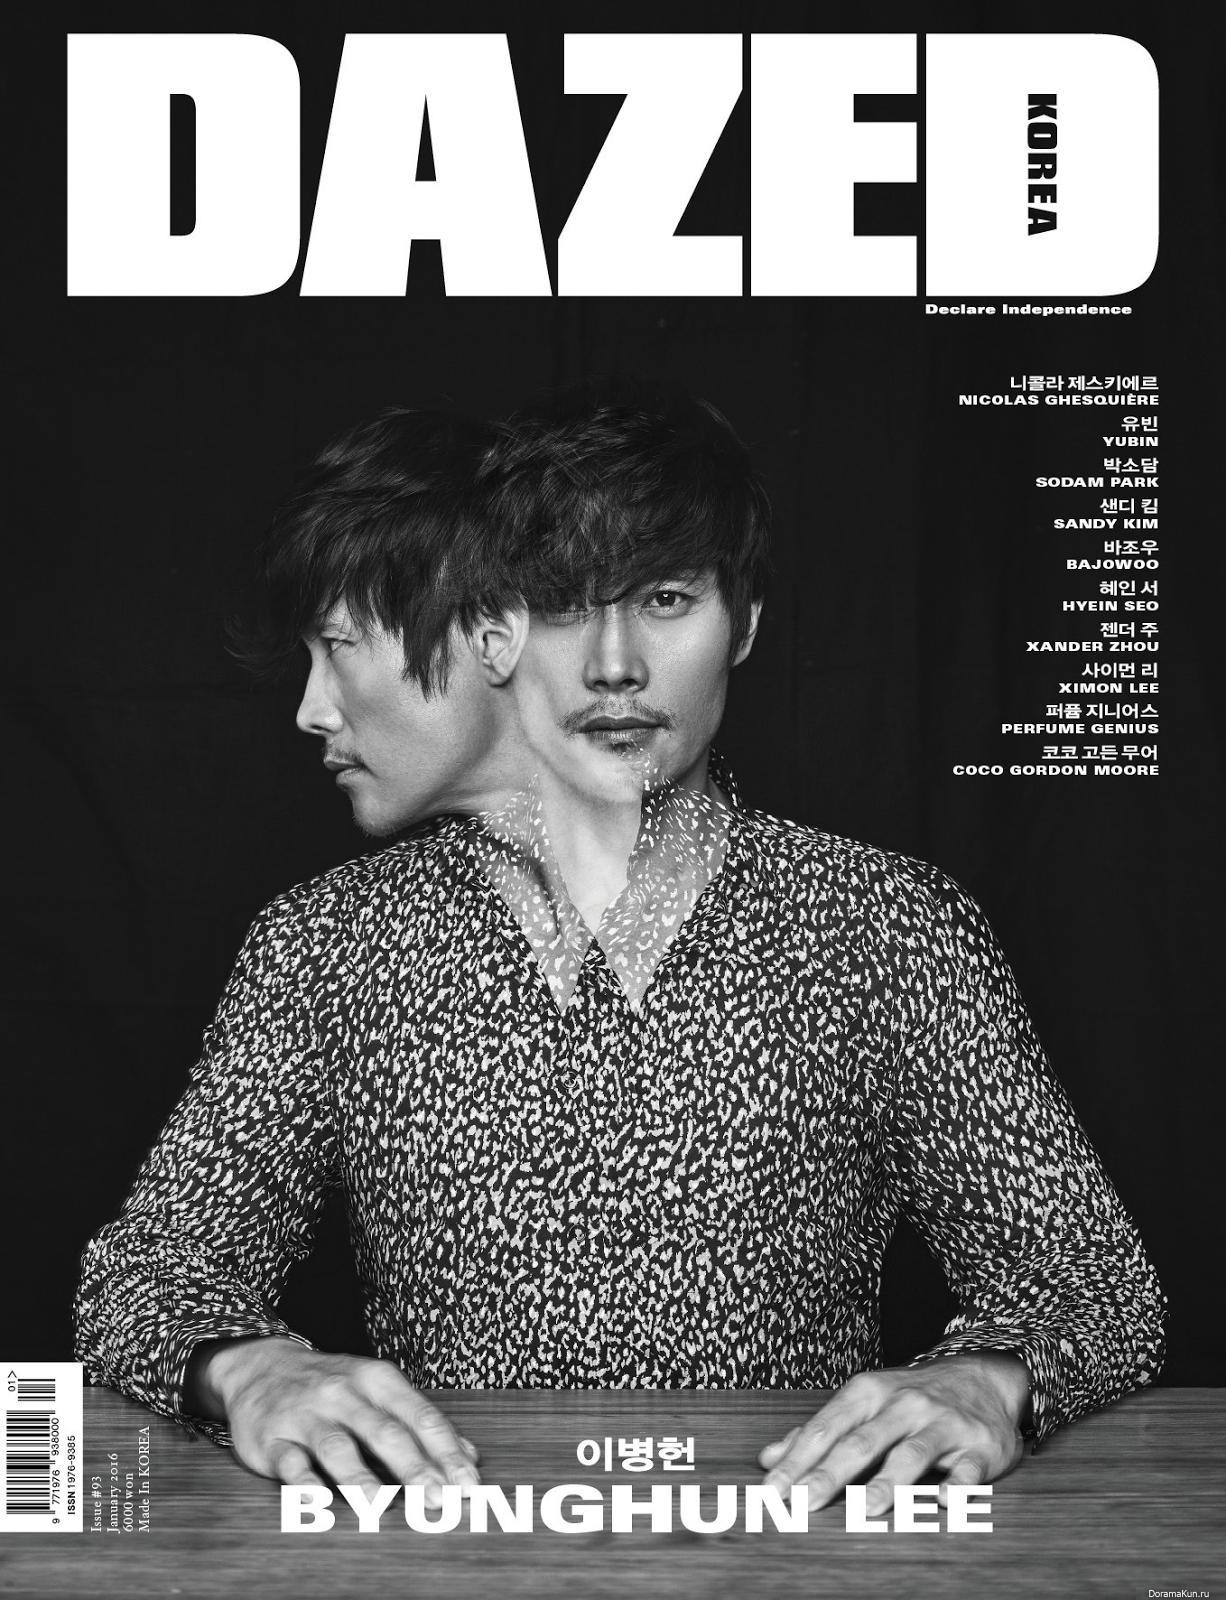 Lee Byung Hun / Ли Бен Хон не пьет одеколон  - Страница 5 Lee-Byung-Hun07-1226